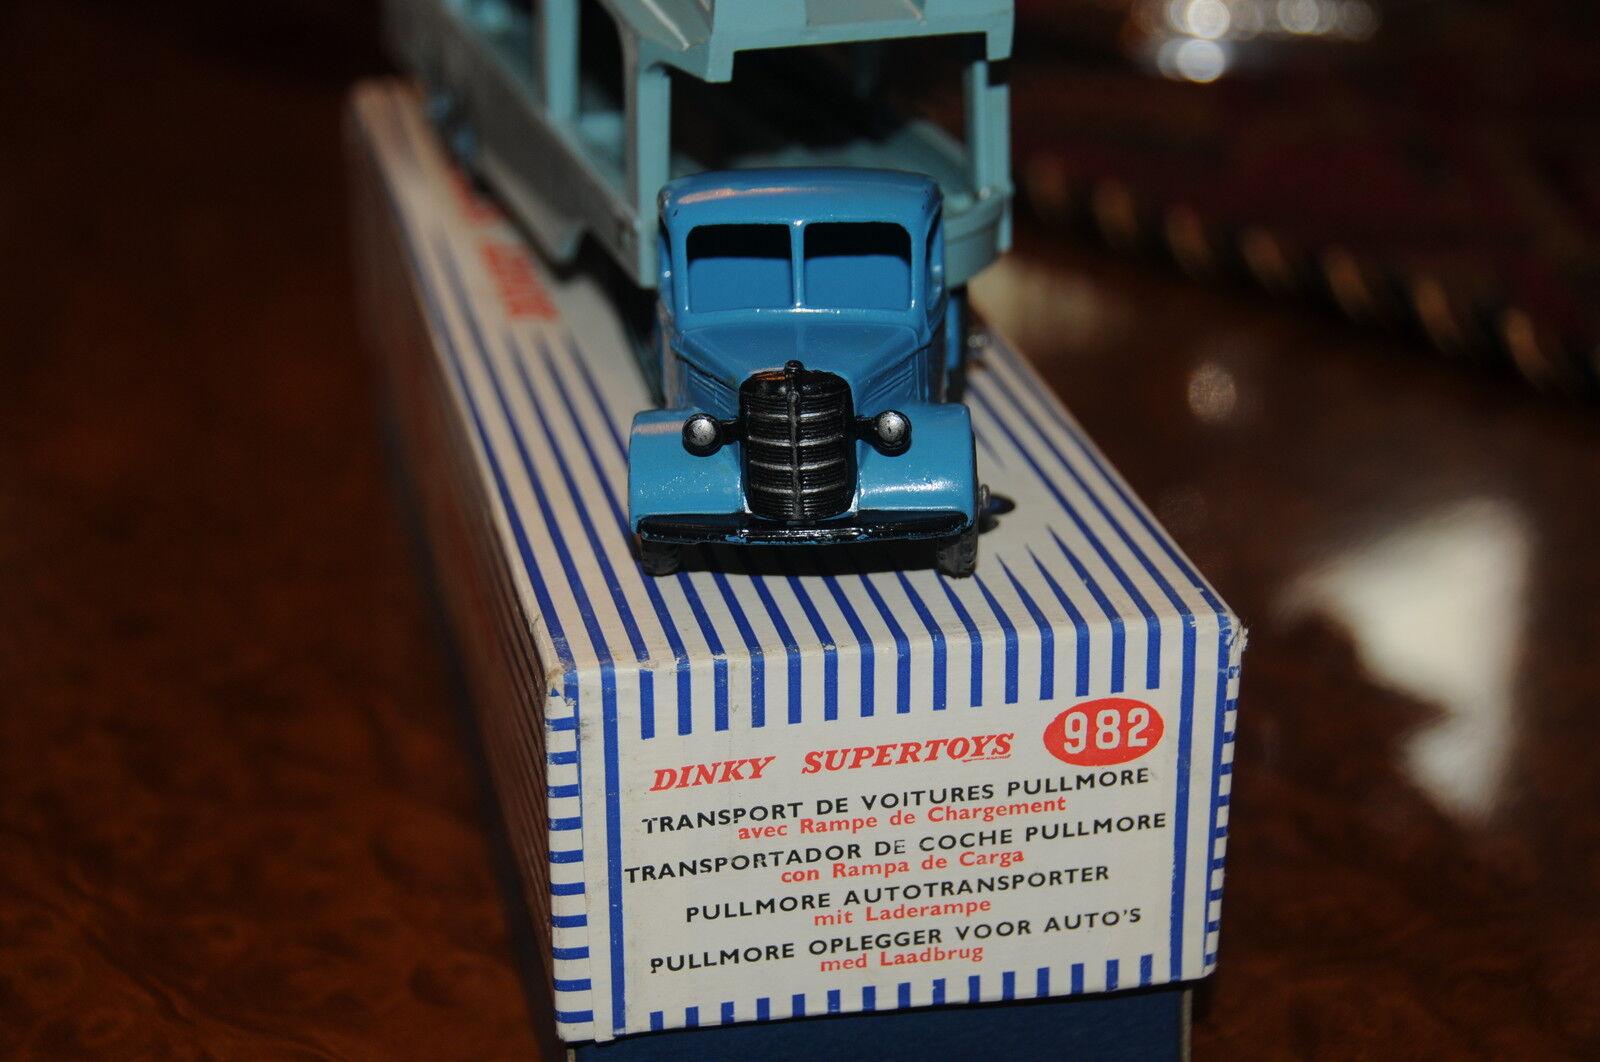 Vintage Dinky Supertoys     MIB   Pullmore Car Transporter   No. 982 87aae7